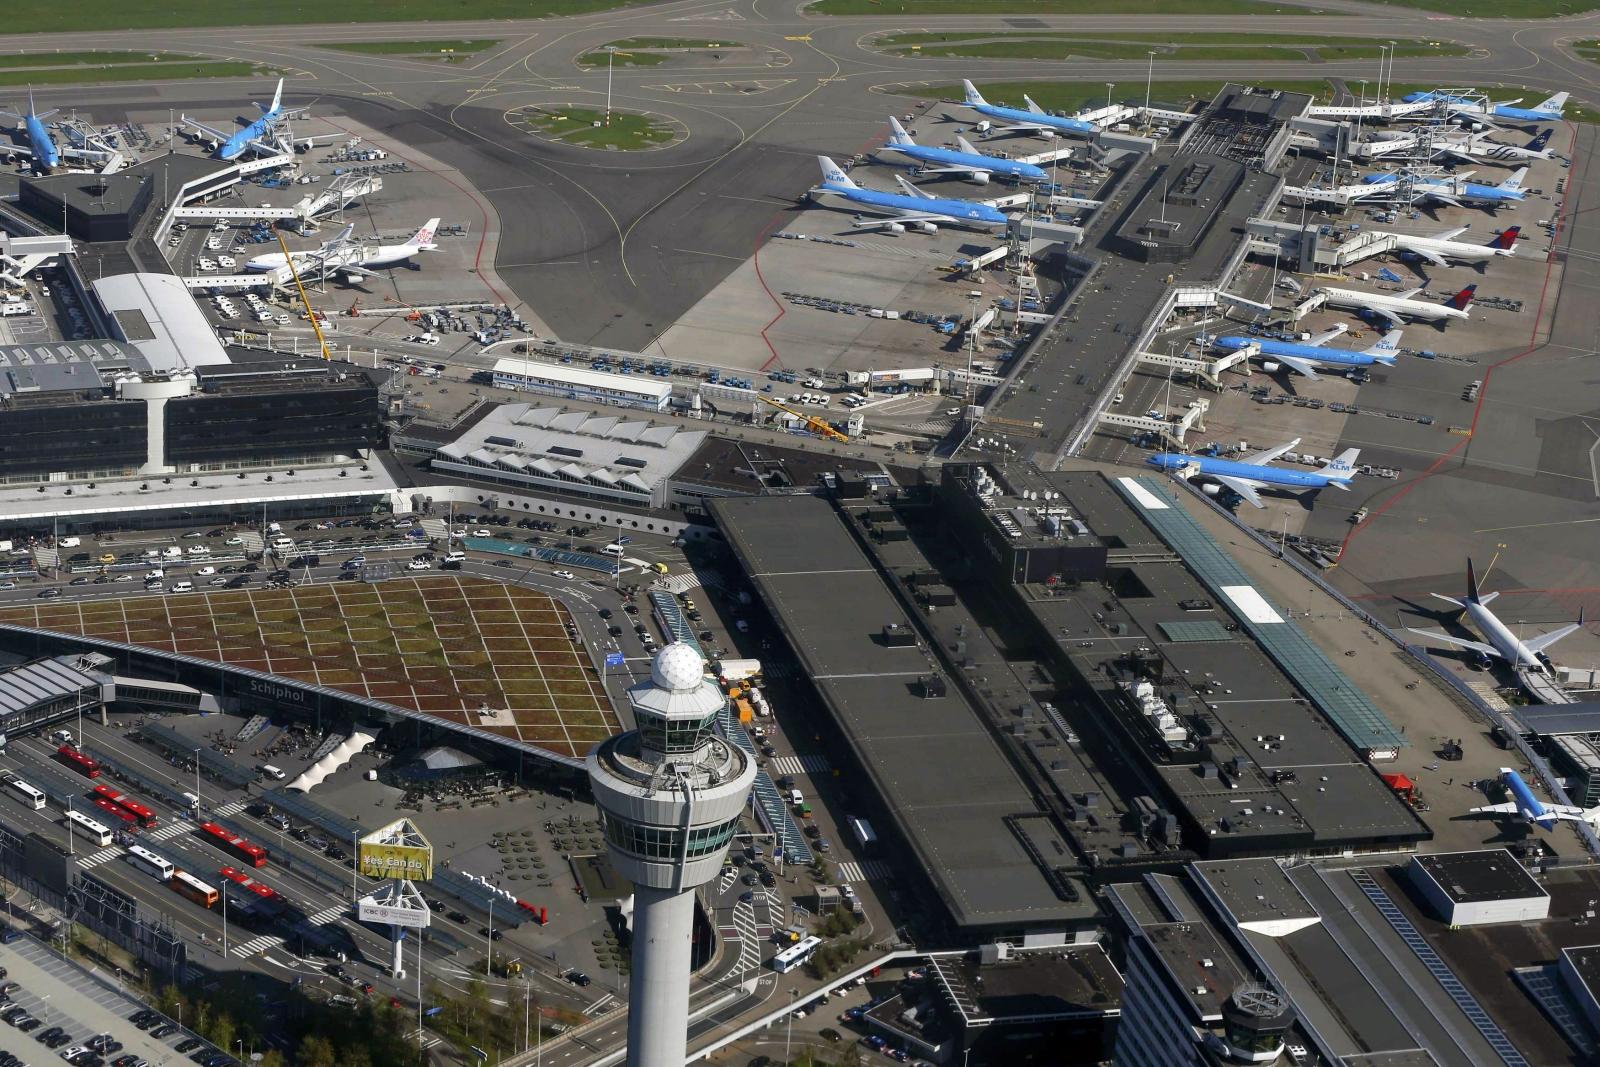 Schiphol airport Amsterdam